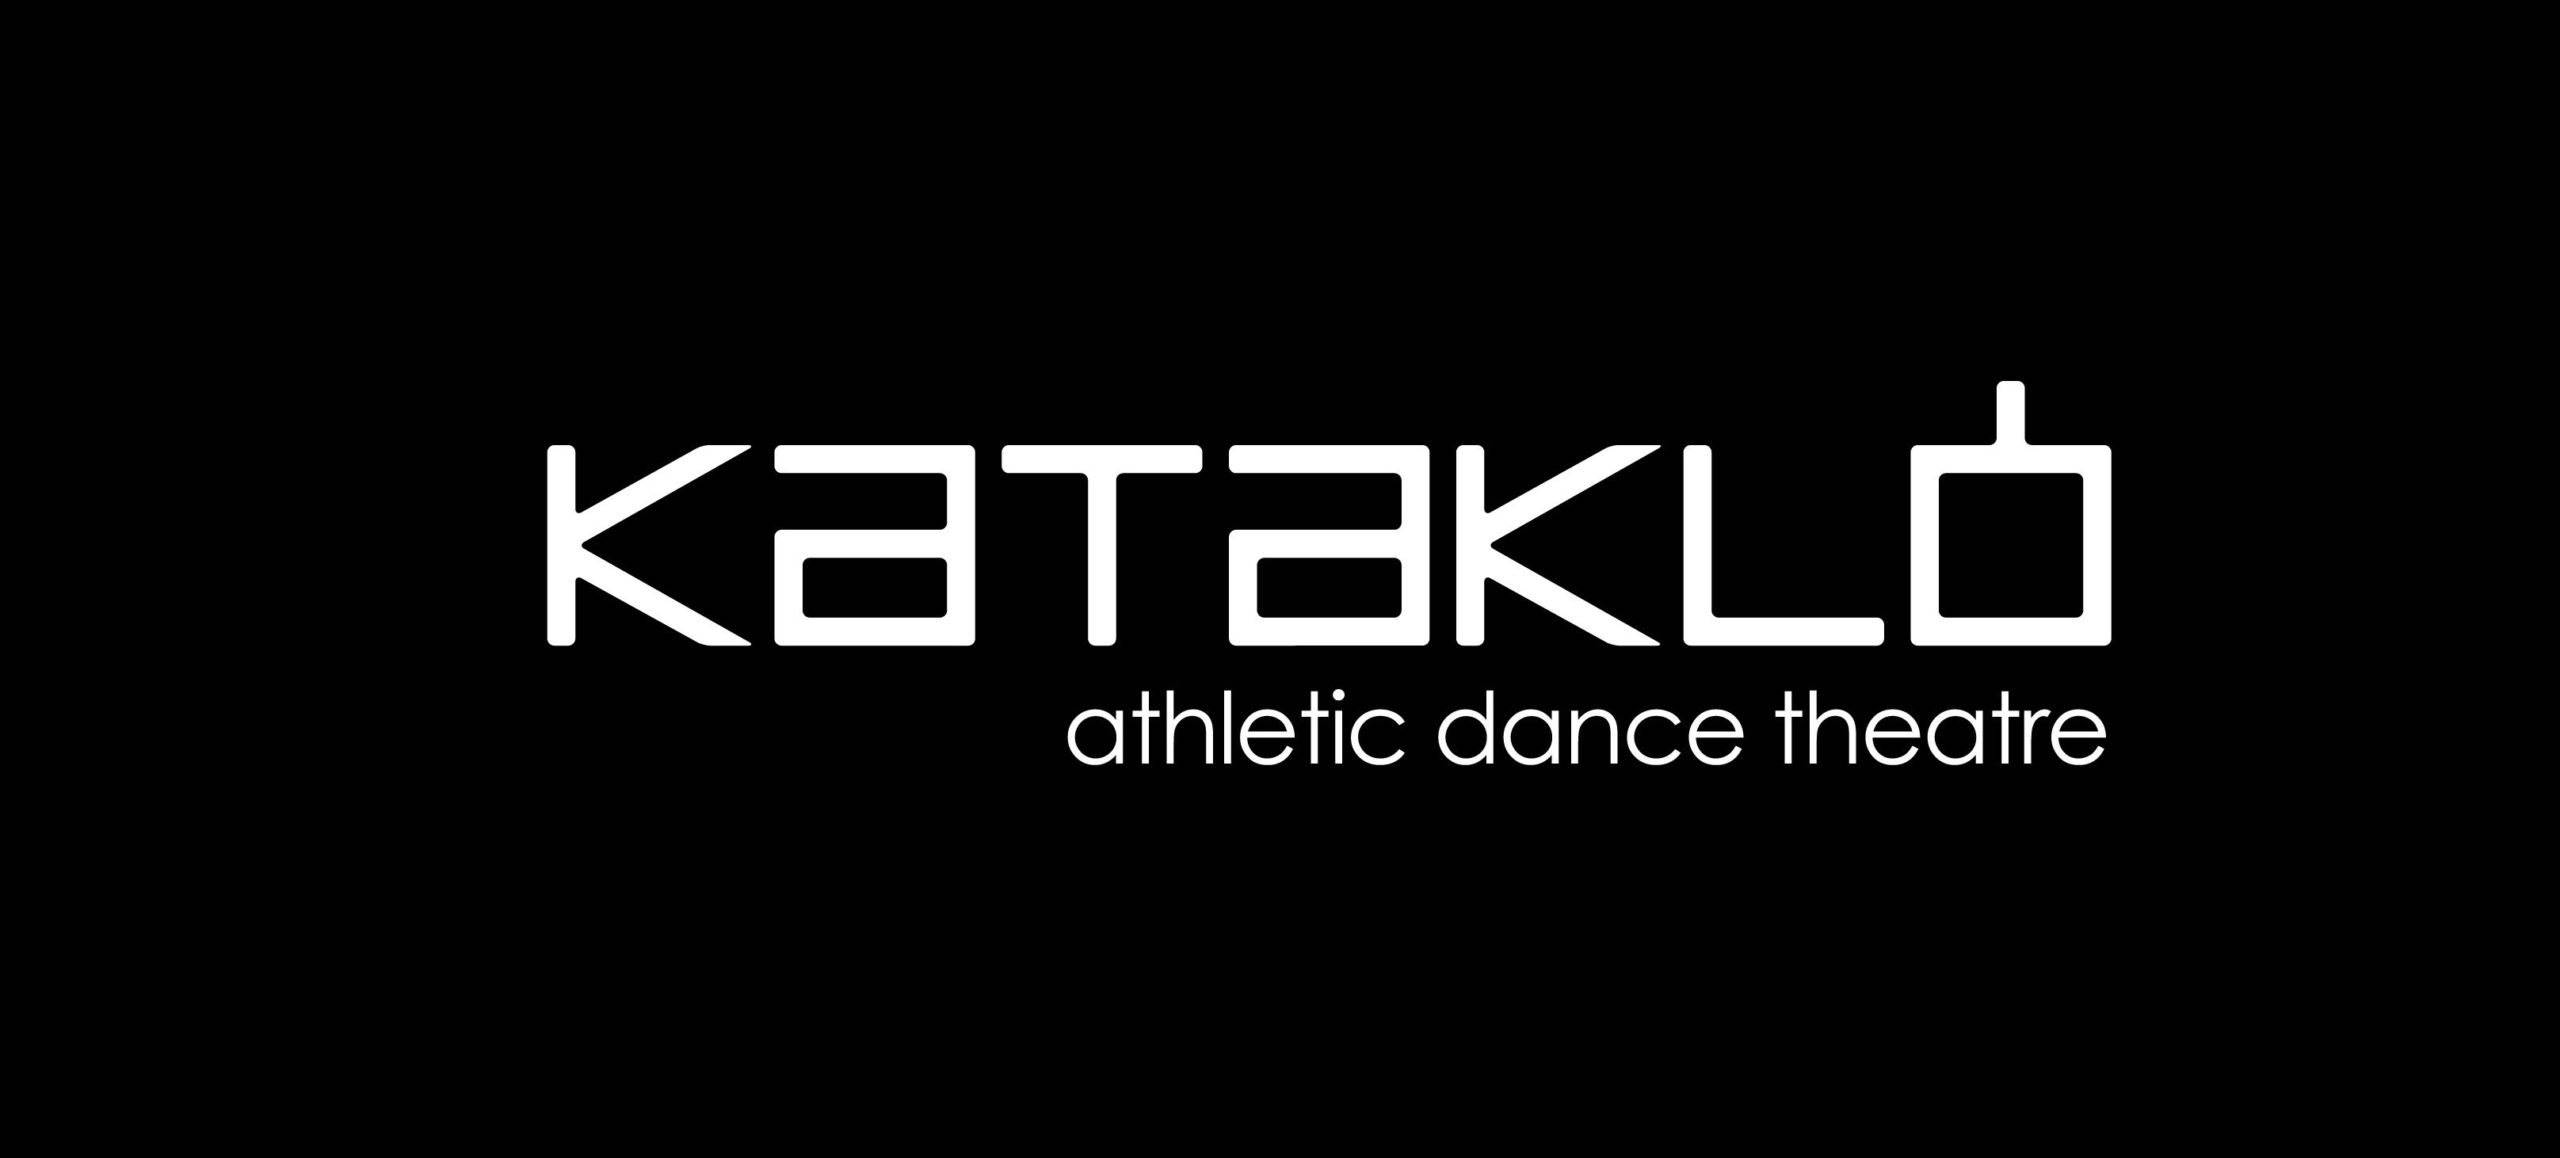 KATAKLÒ ATHLETIC DANCE INTERPRETS ROBERTO COLLINA'S SS 2021 COLLECTION